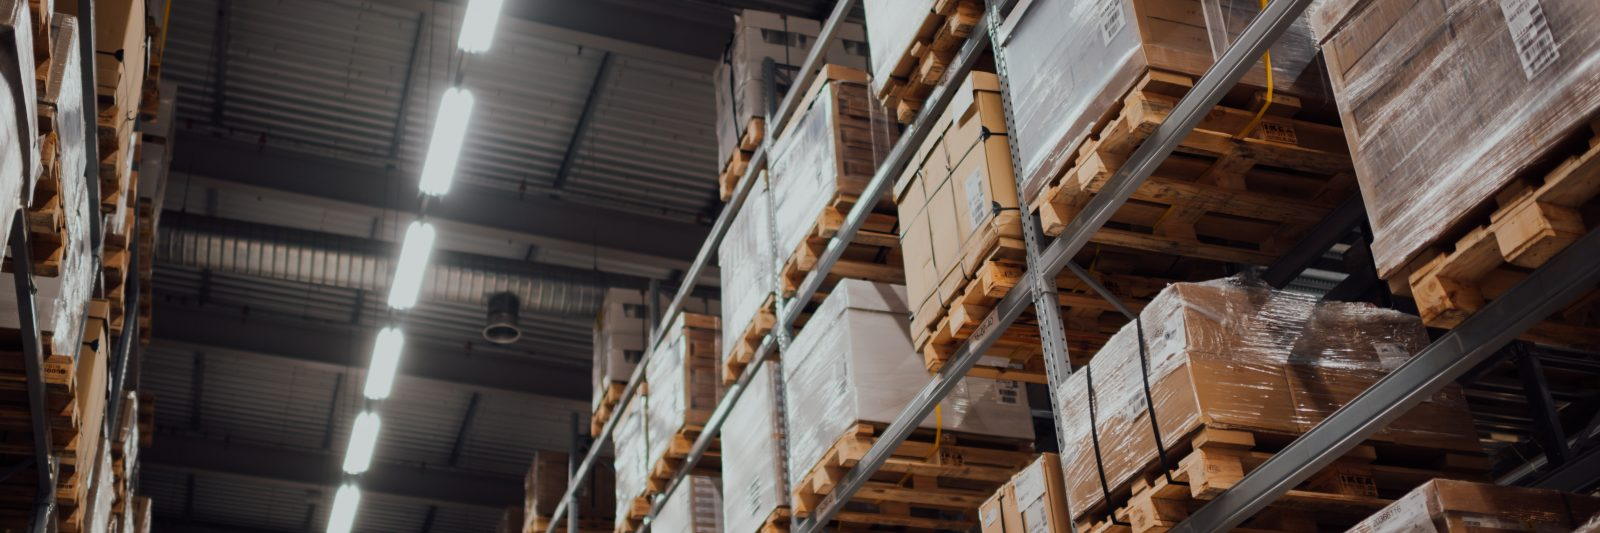 amazon returns pallet liquidation